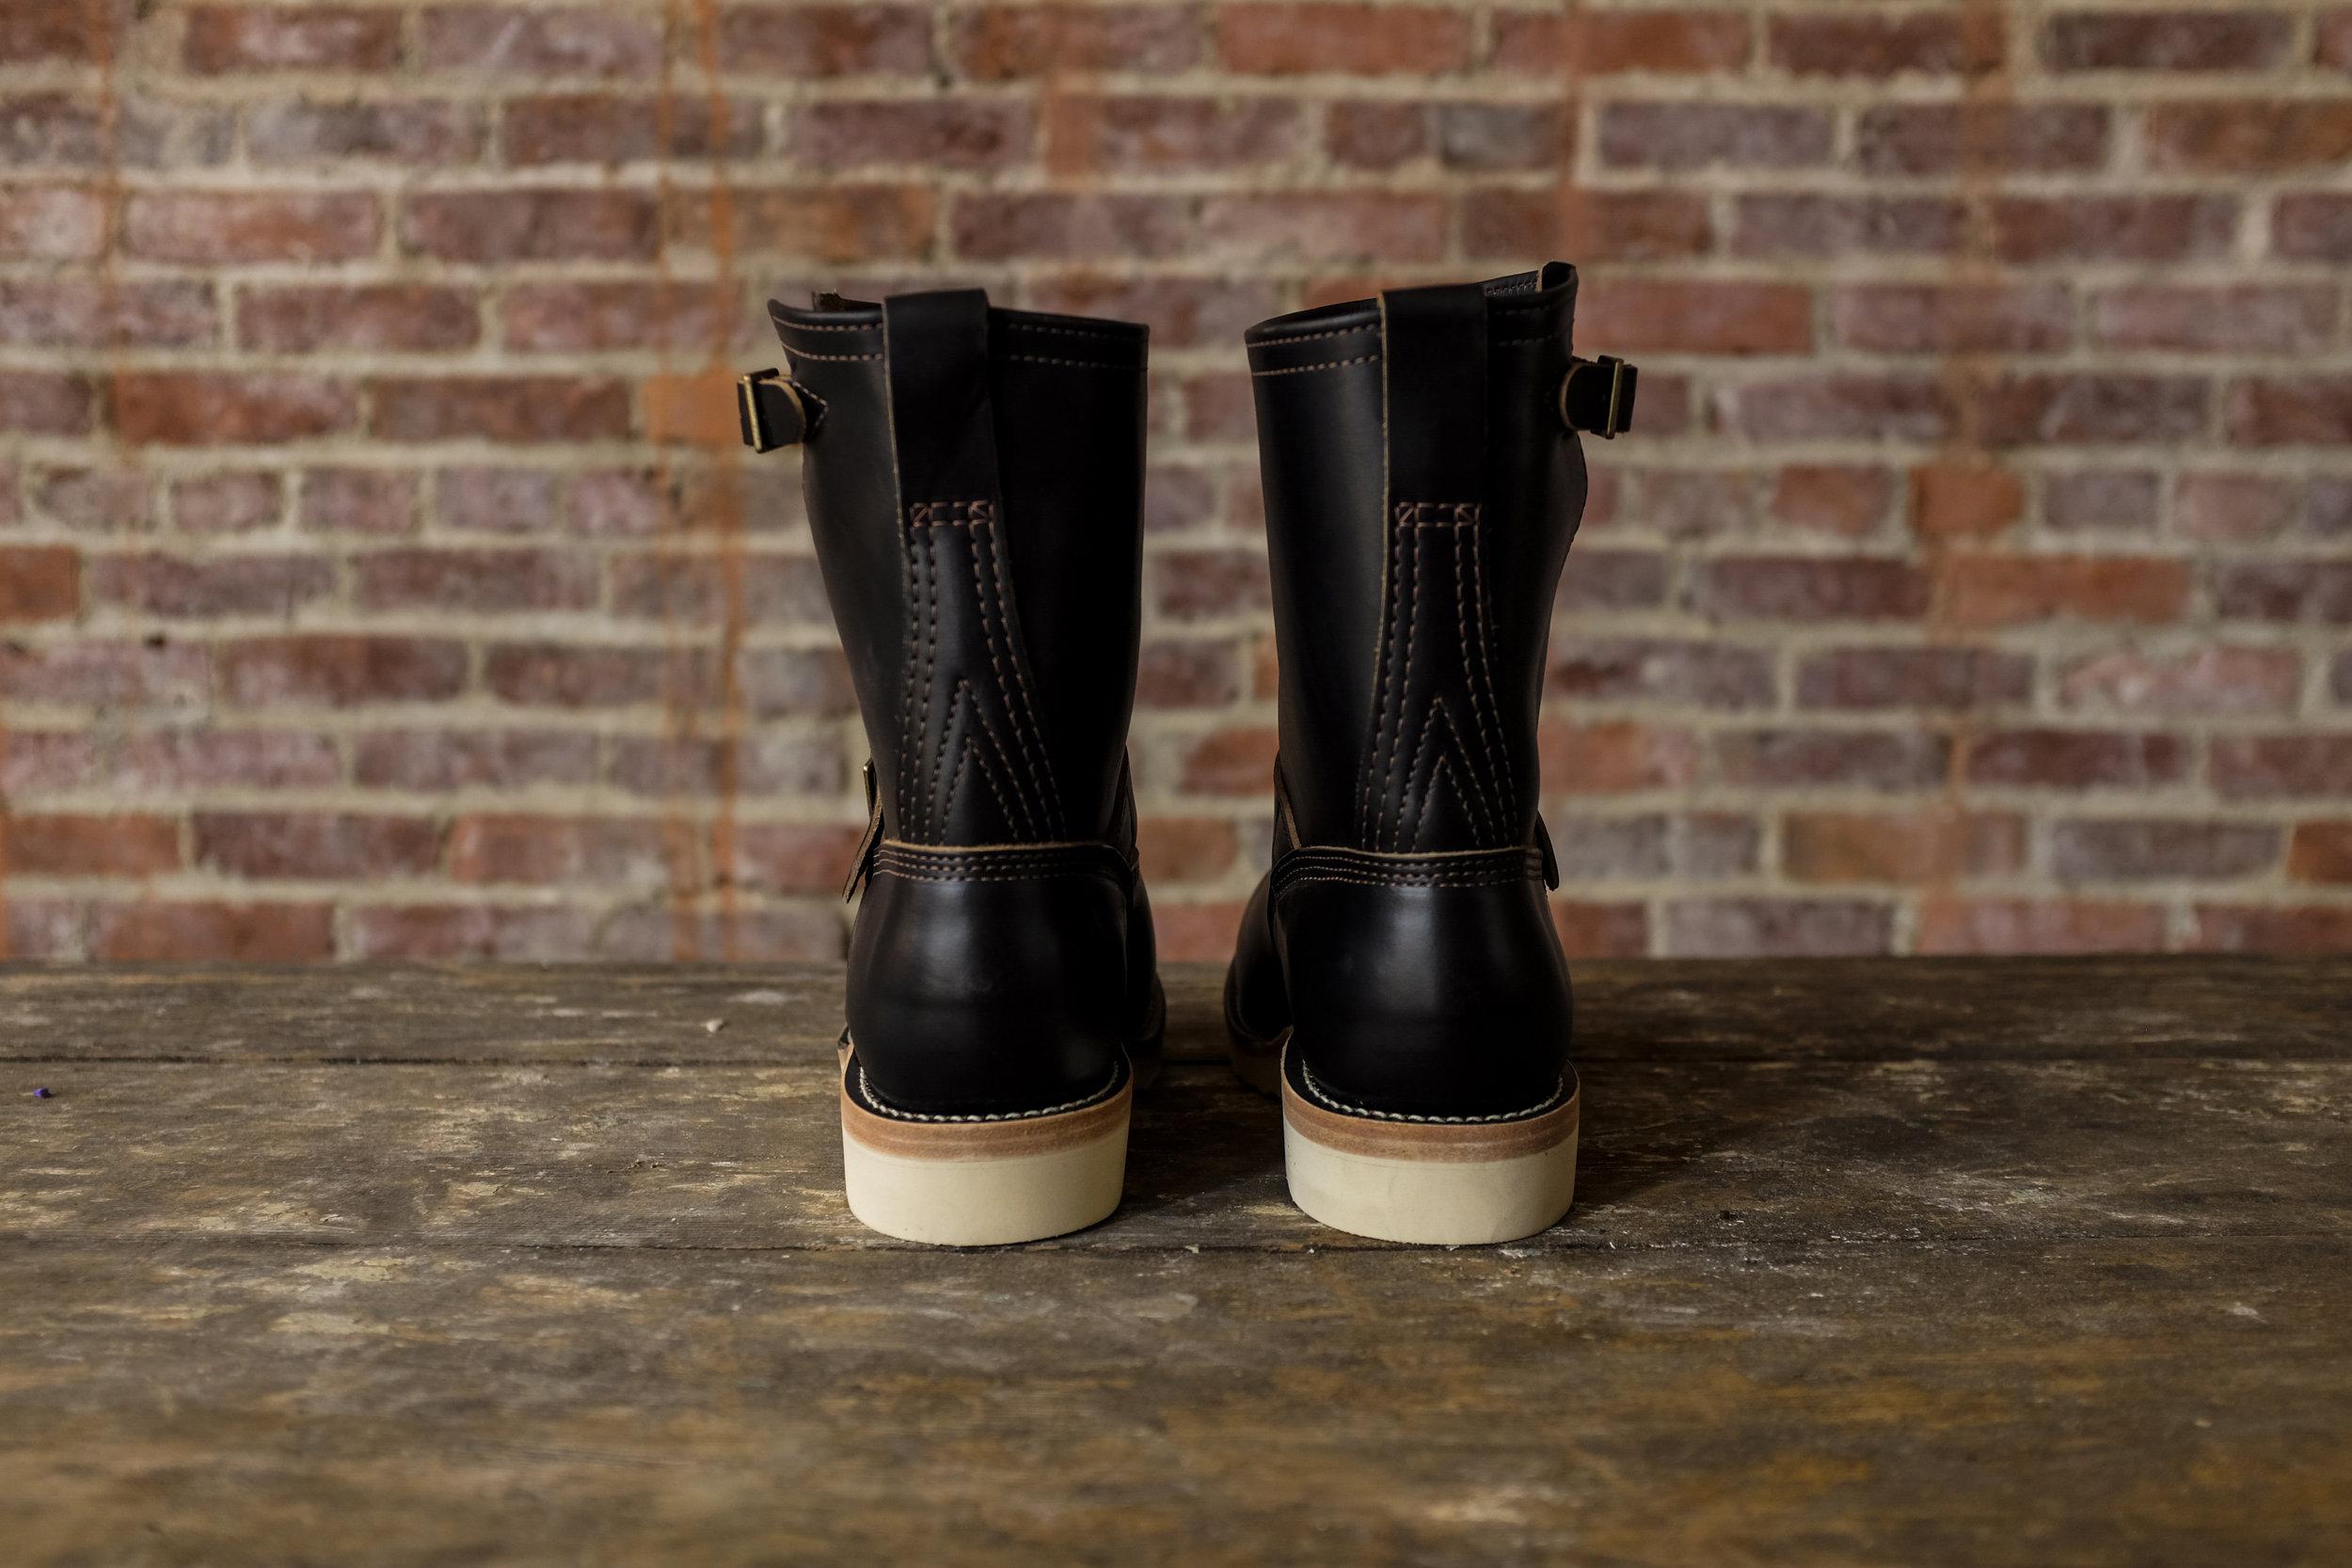 Black Bear Brand x Wesco BOSS in Horween Leather